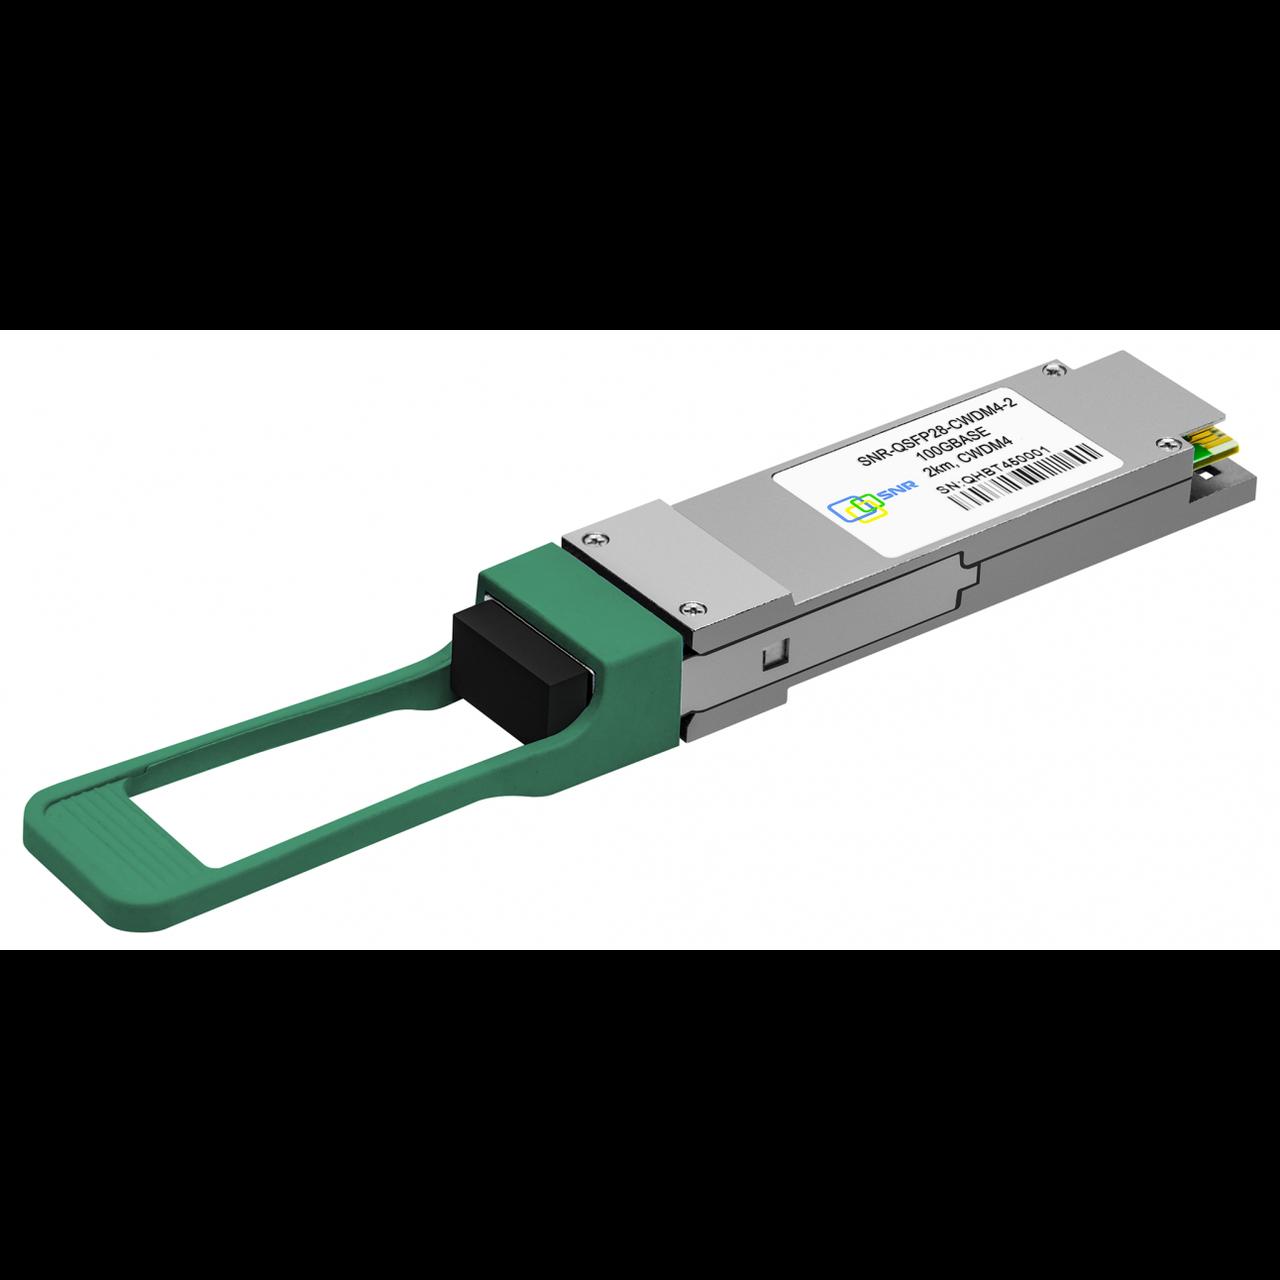 Модуль, QSFP28-DD-CWDM4 200GBASE, разъем CS дальность до 2км